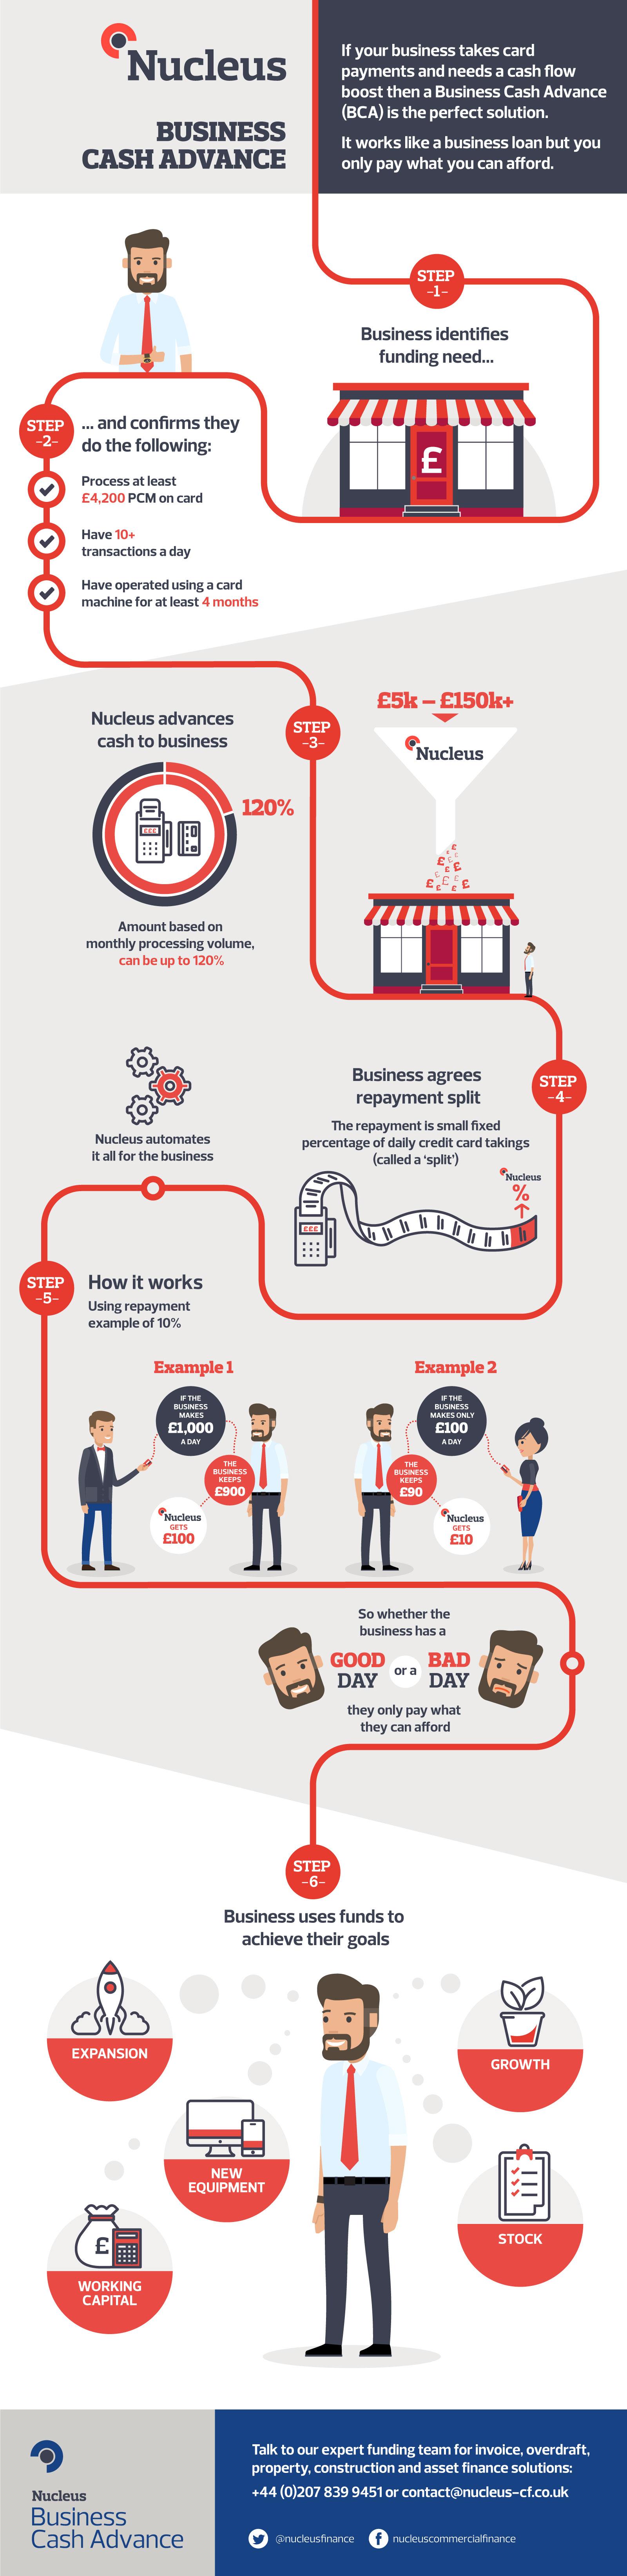 Business-Cash-Advance-infographic.jpg